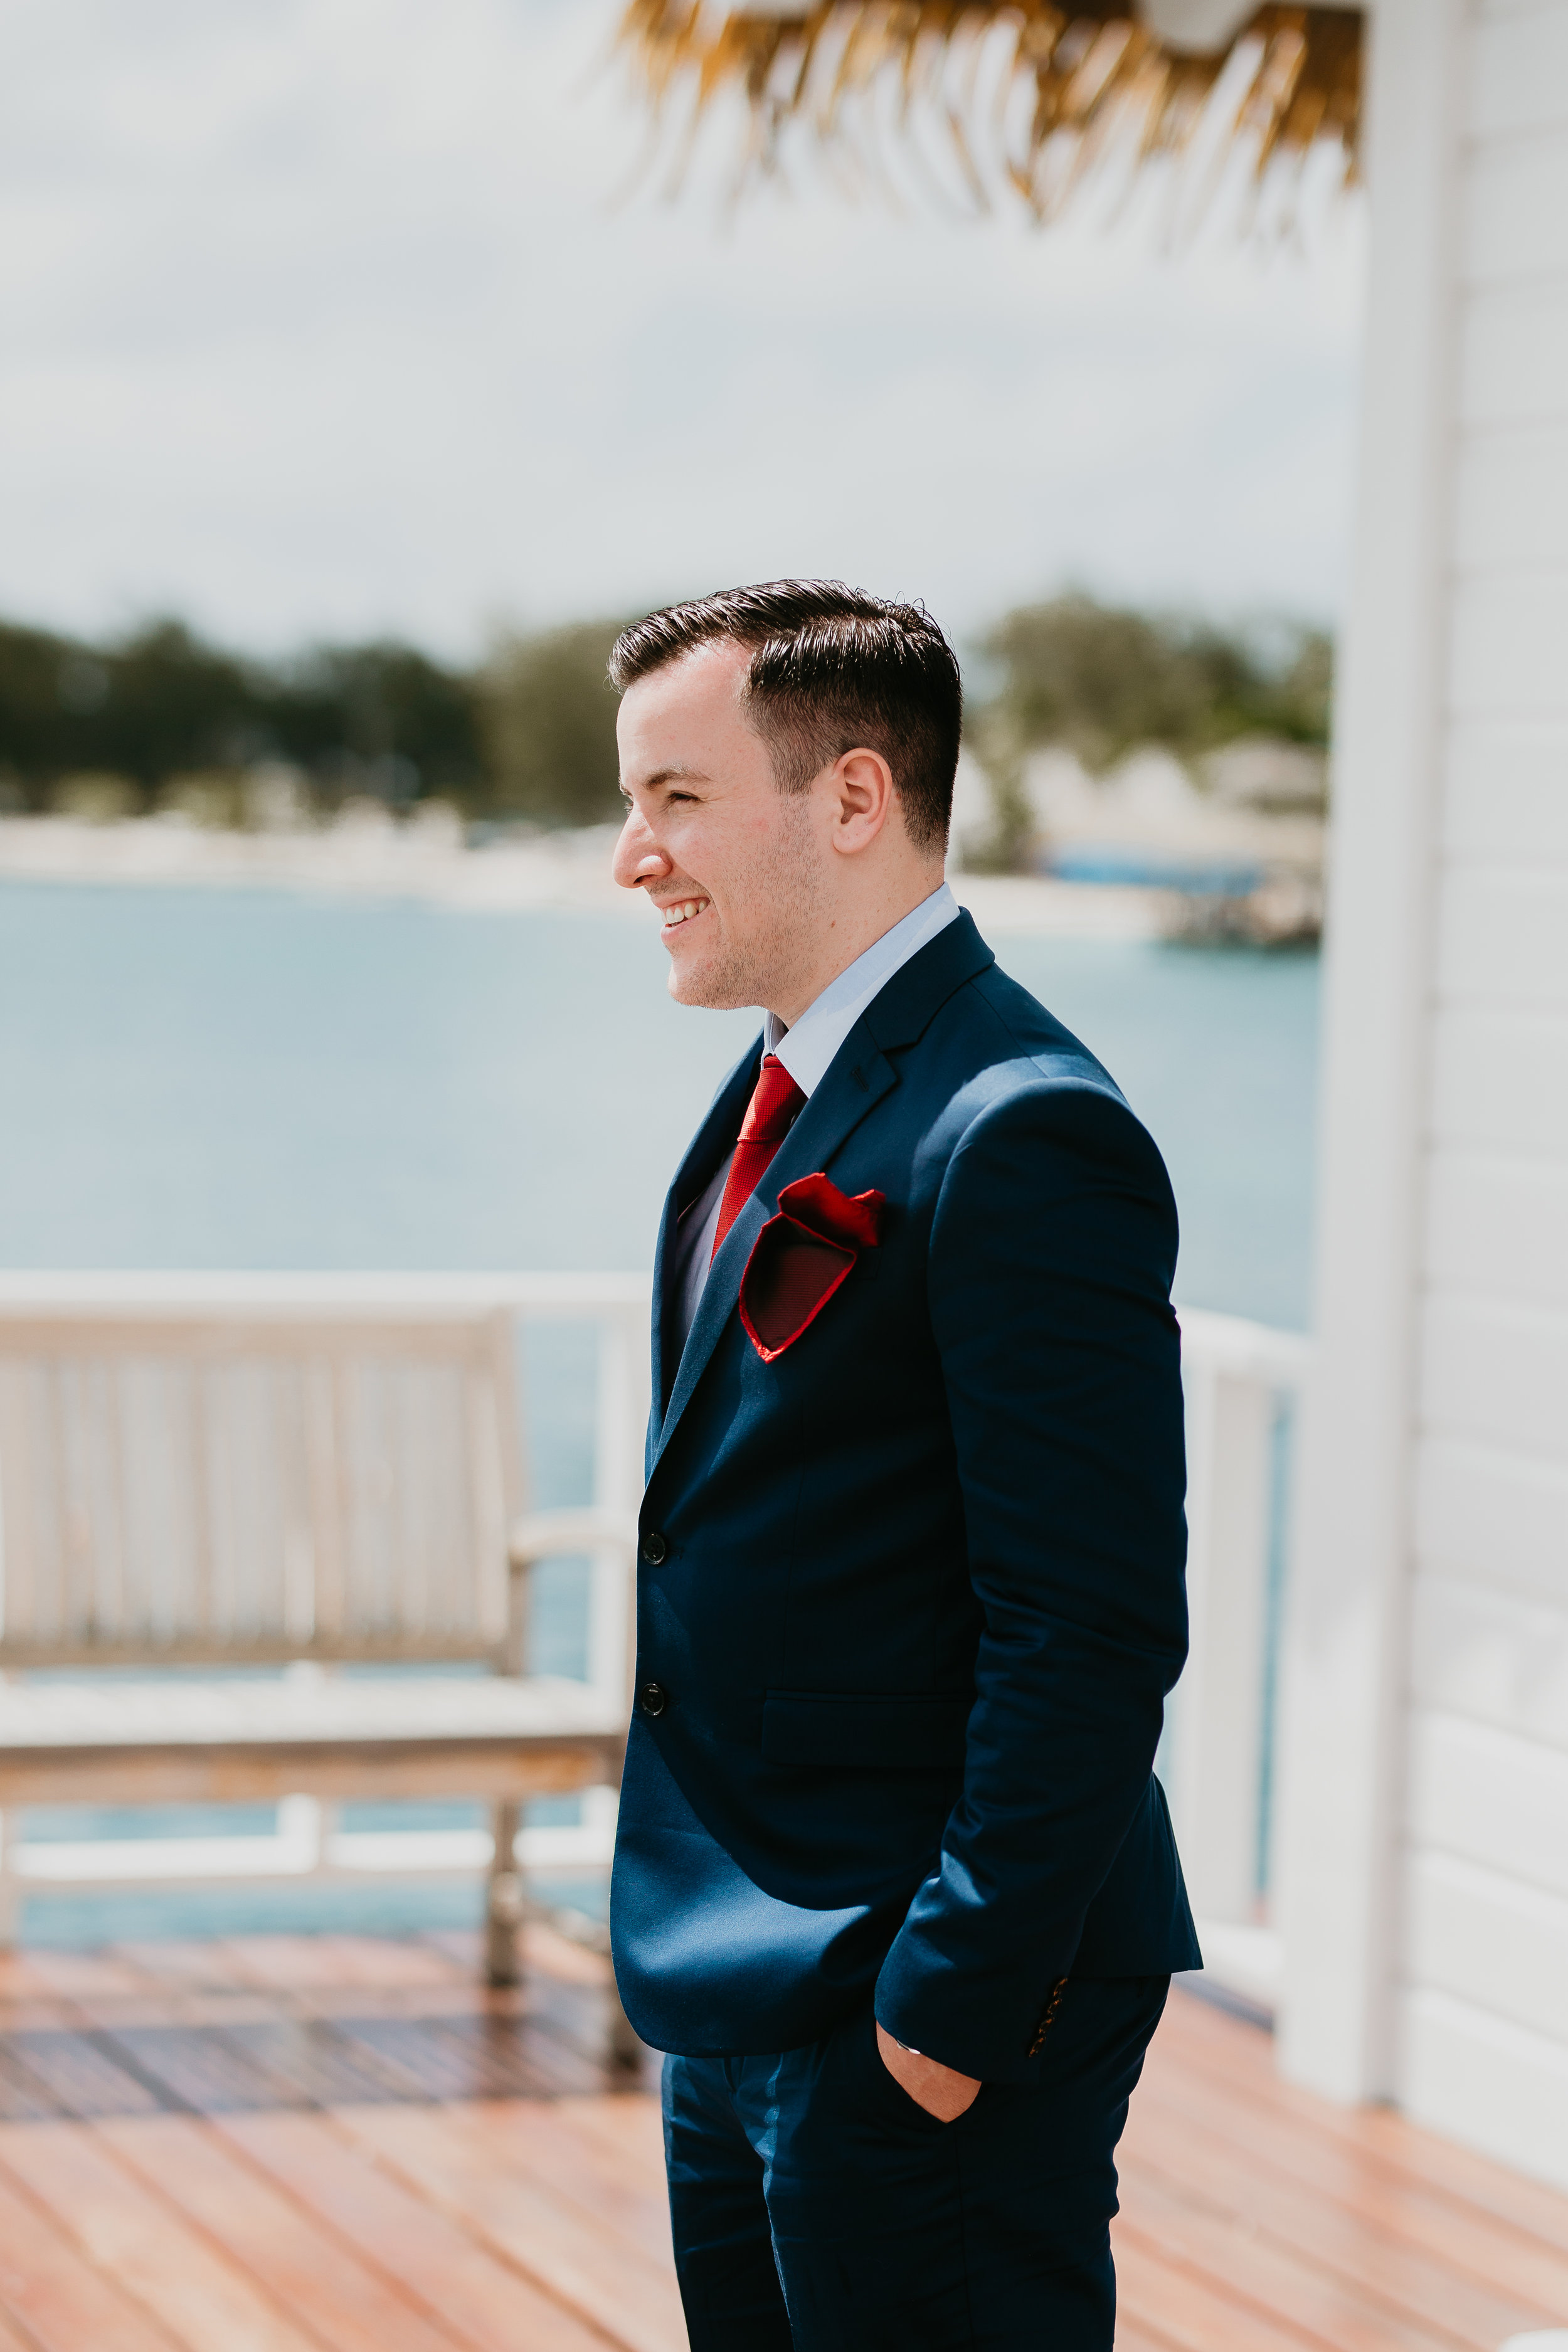 nicole-daacke-photography-destination-wedding-in-st-lucia-sandals-la-toc-intimate-island-wedding-carribean-elopement-photographer-chill-island-wedding-25.jpg